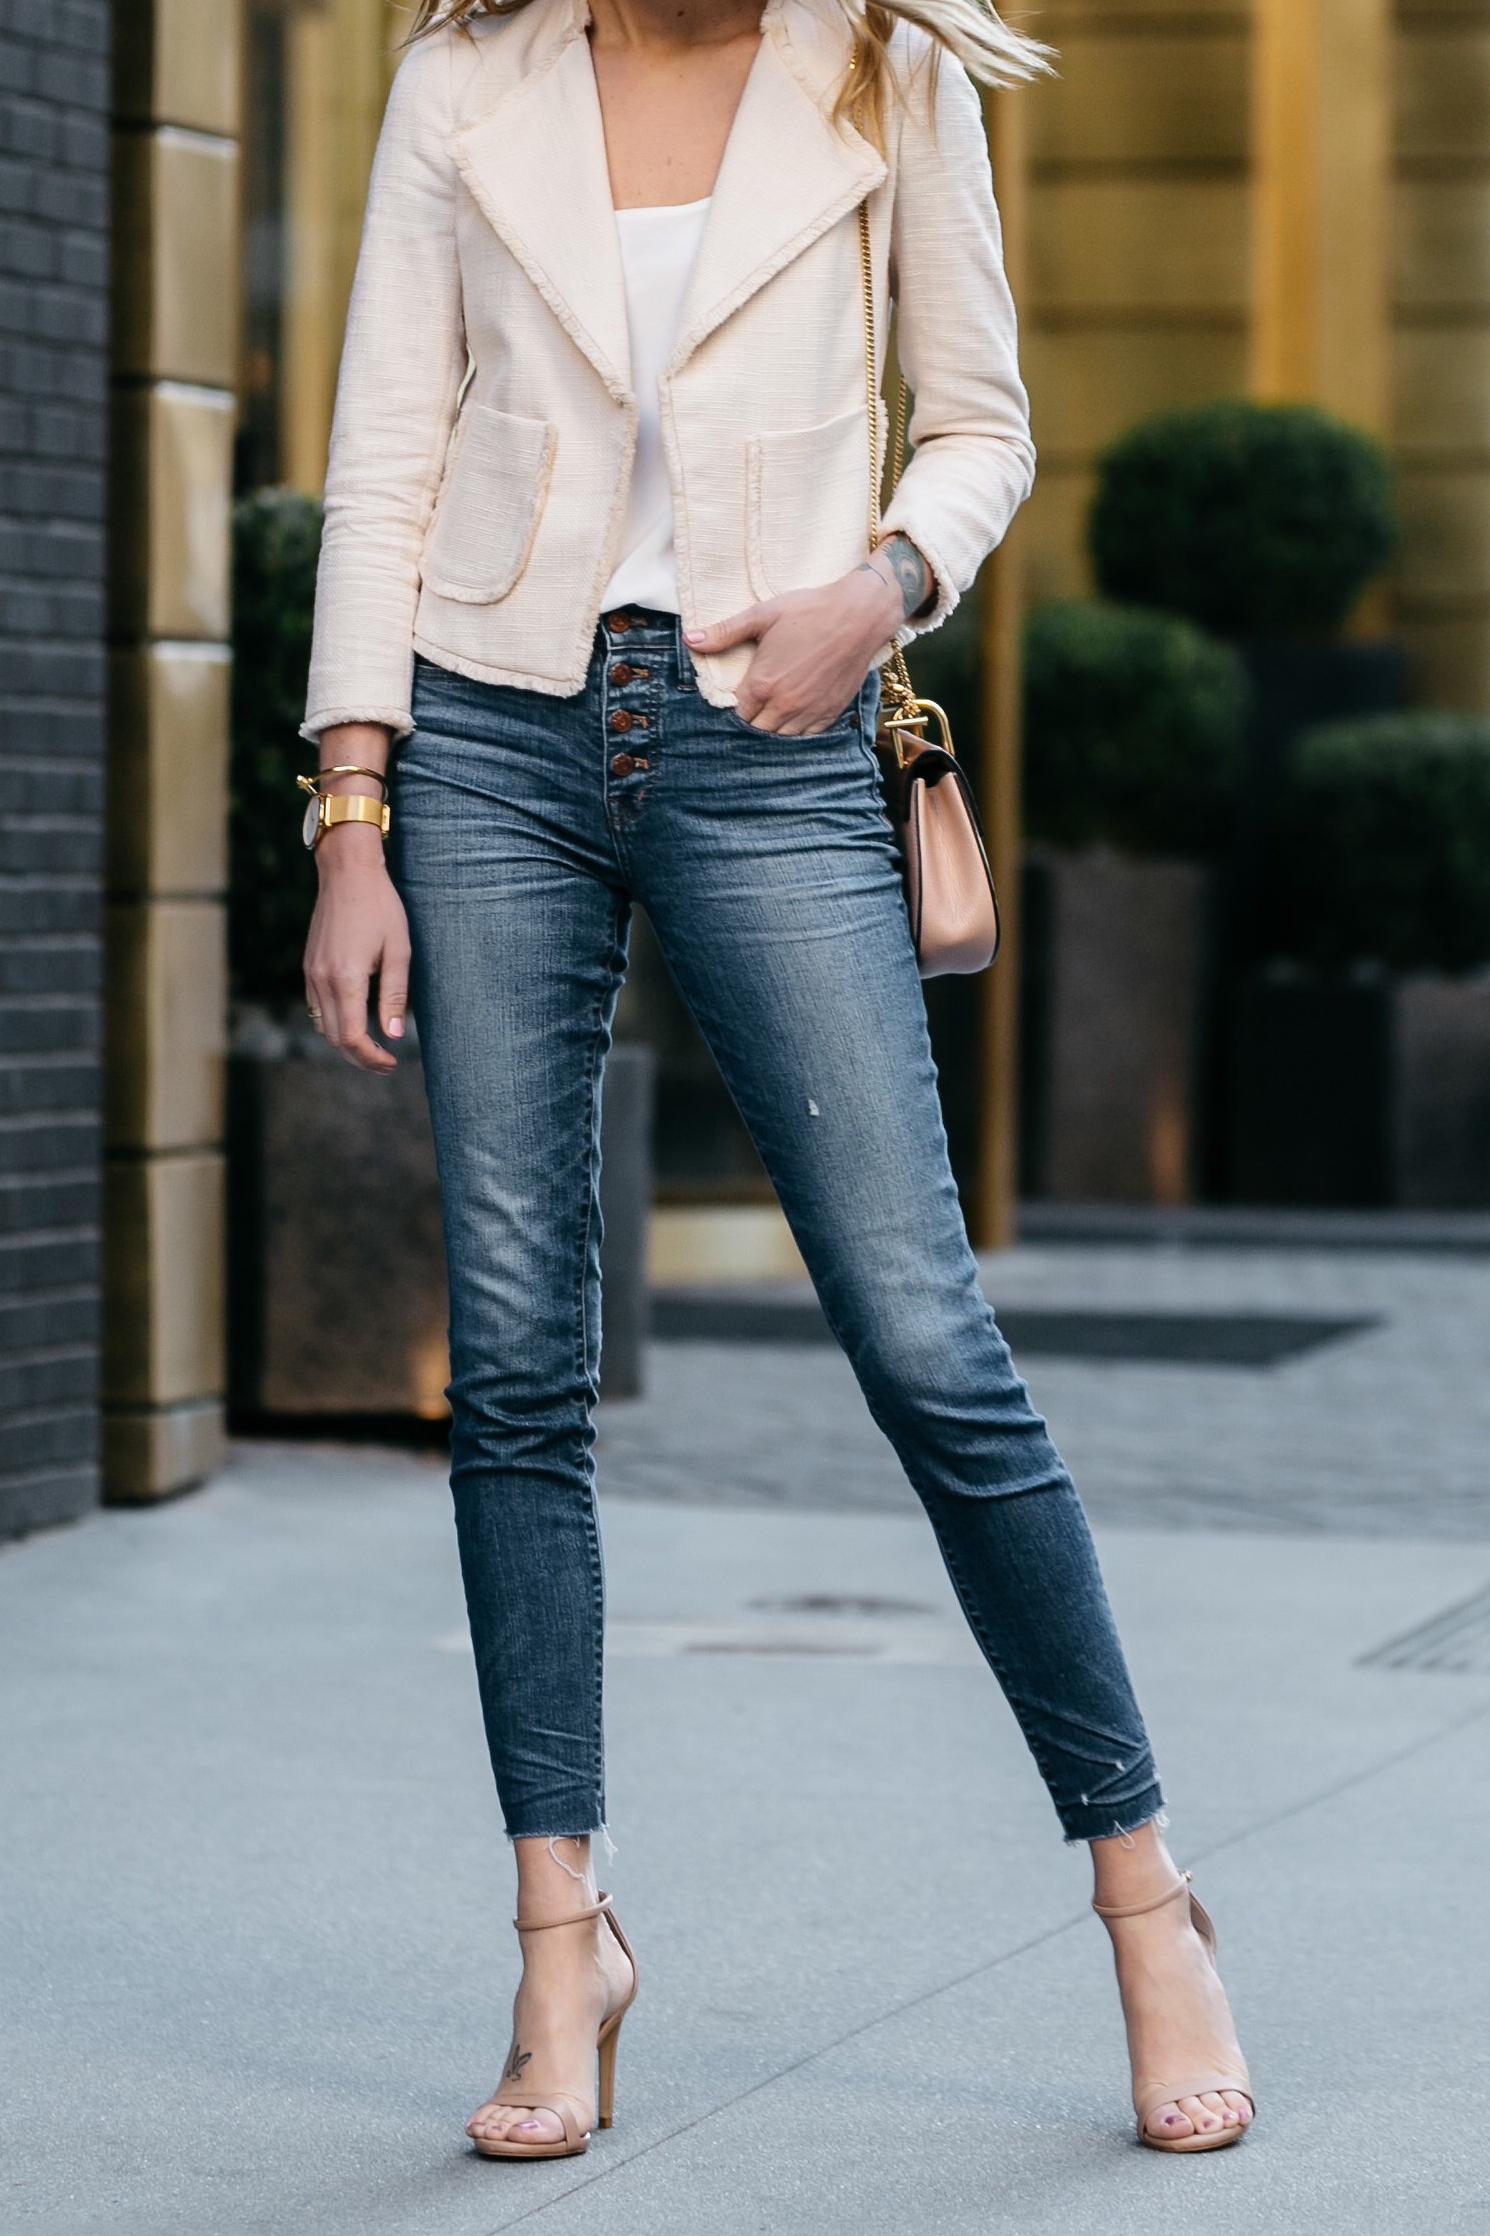 Fashion Jackson, Dallas Blogger, Fashion Blogger, Street Style, Ann Taylor Blush Tweed Jacket, Club Monaco White Cami, Madewell Denim Skinny Jeans, Chloe Drew Handbag, Steve Madden Nude Ankle Strap Heels